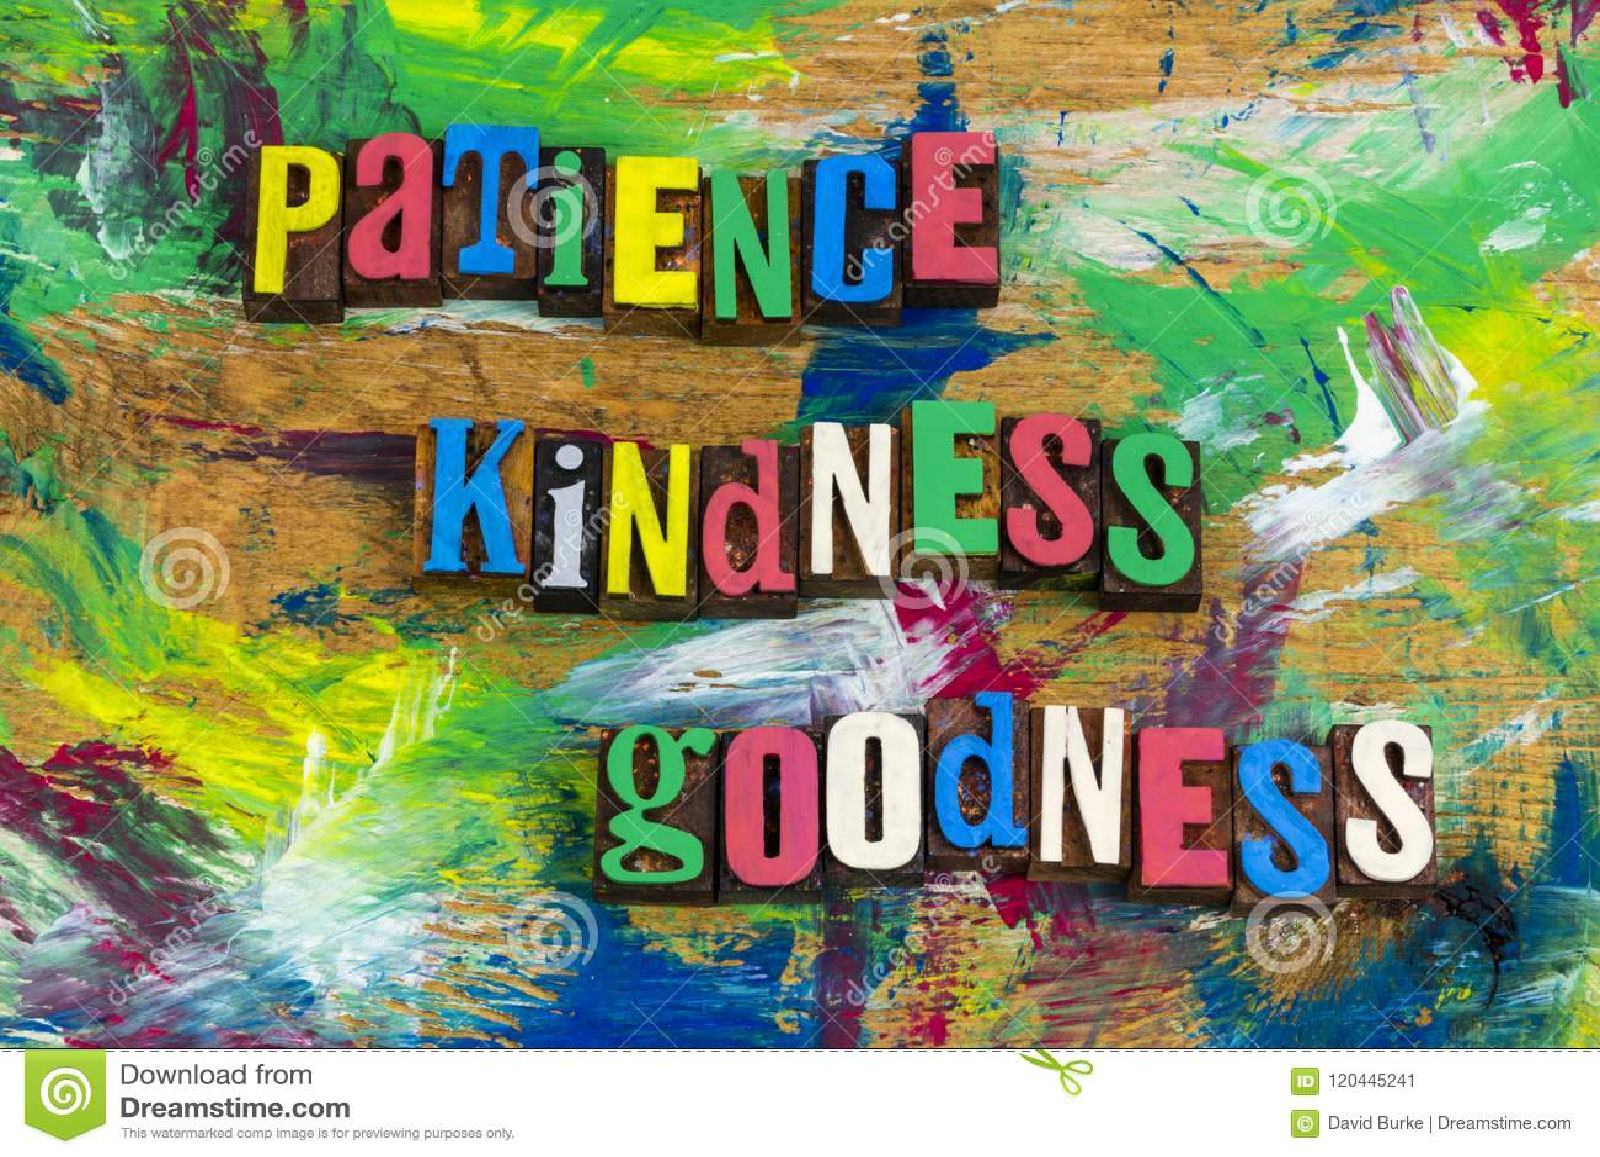 Patience kindness goodness forgiveness